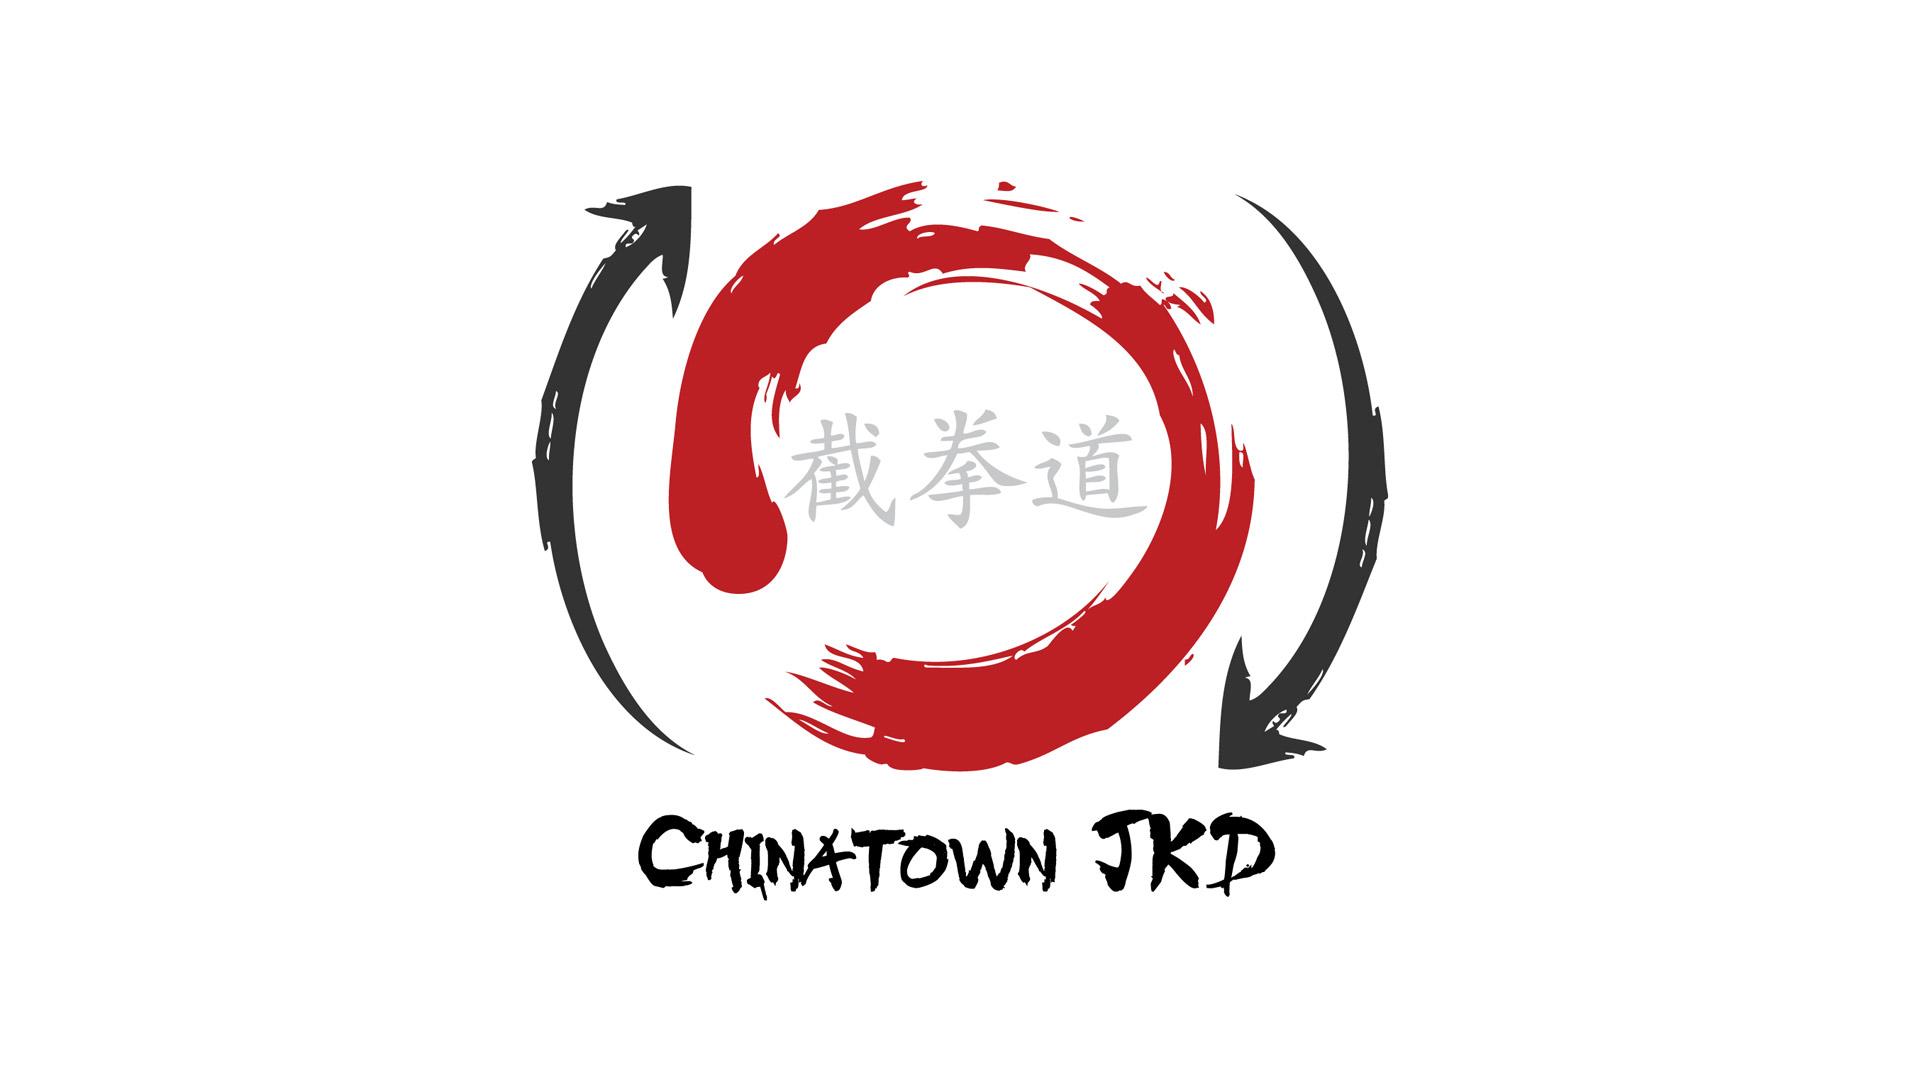 Official Chinatown Jkd Association The Art Of Jeet Kune Do